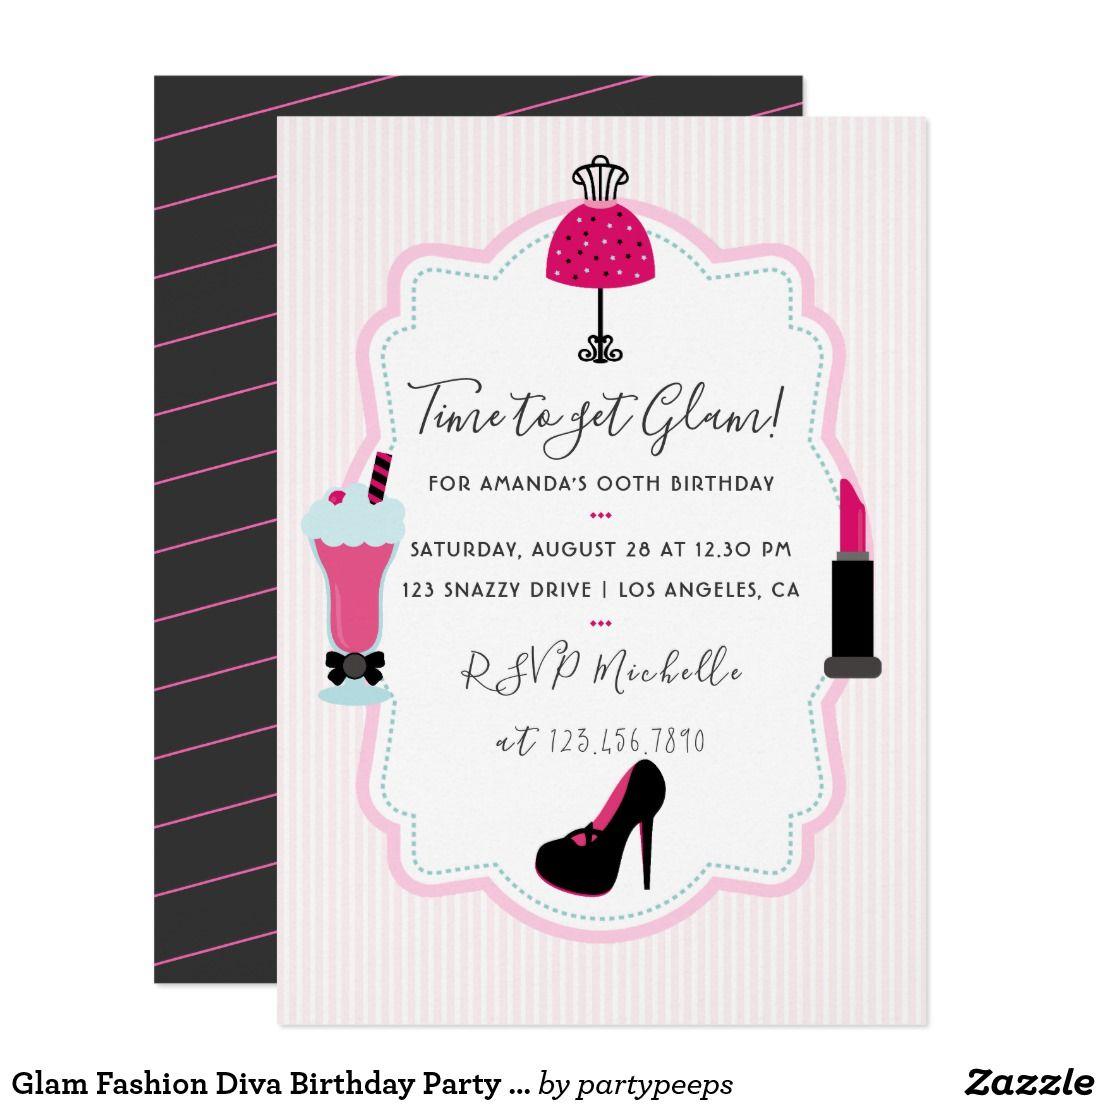 Glam Fashion Diva Birthday Party Invitation Cool Diva Fashion Show ...